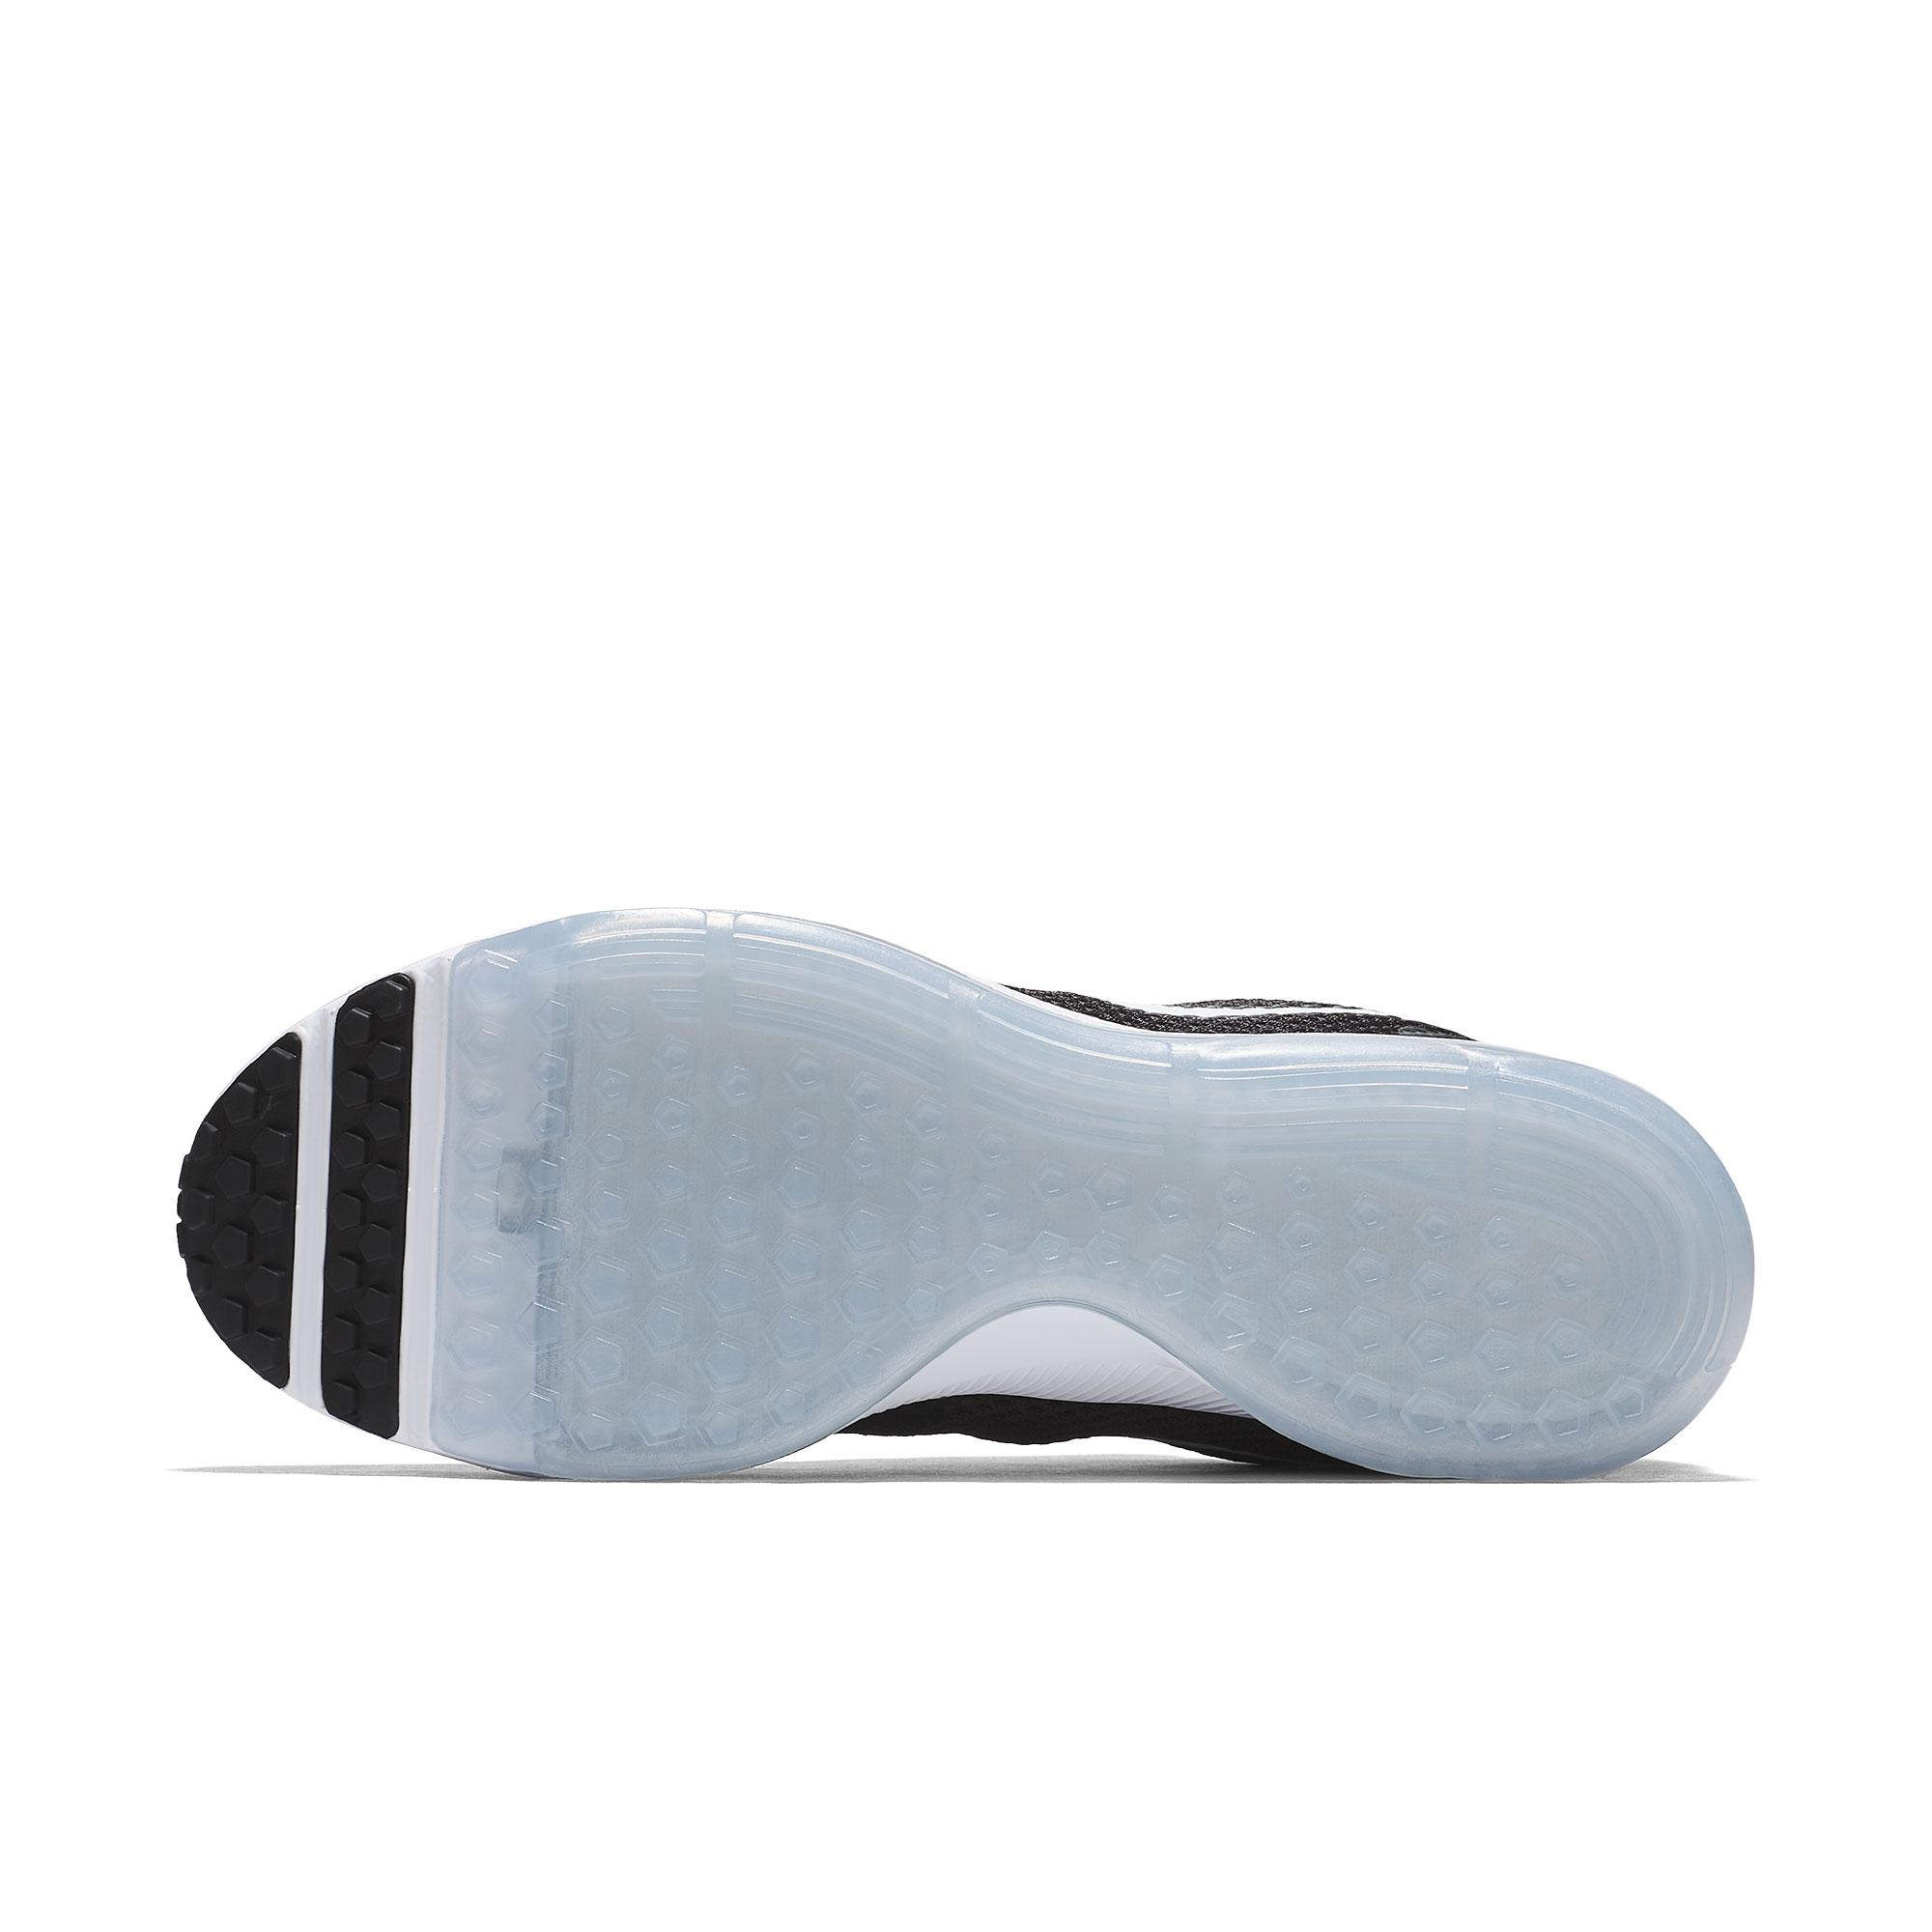 6a5abe08b233c1339abdaeded19109db - NIKE ZOOM ALL OUT LOW 2 男子 氣墊慢跑鞋 黑白 緩震 時尚 百搭 AJ0035